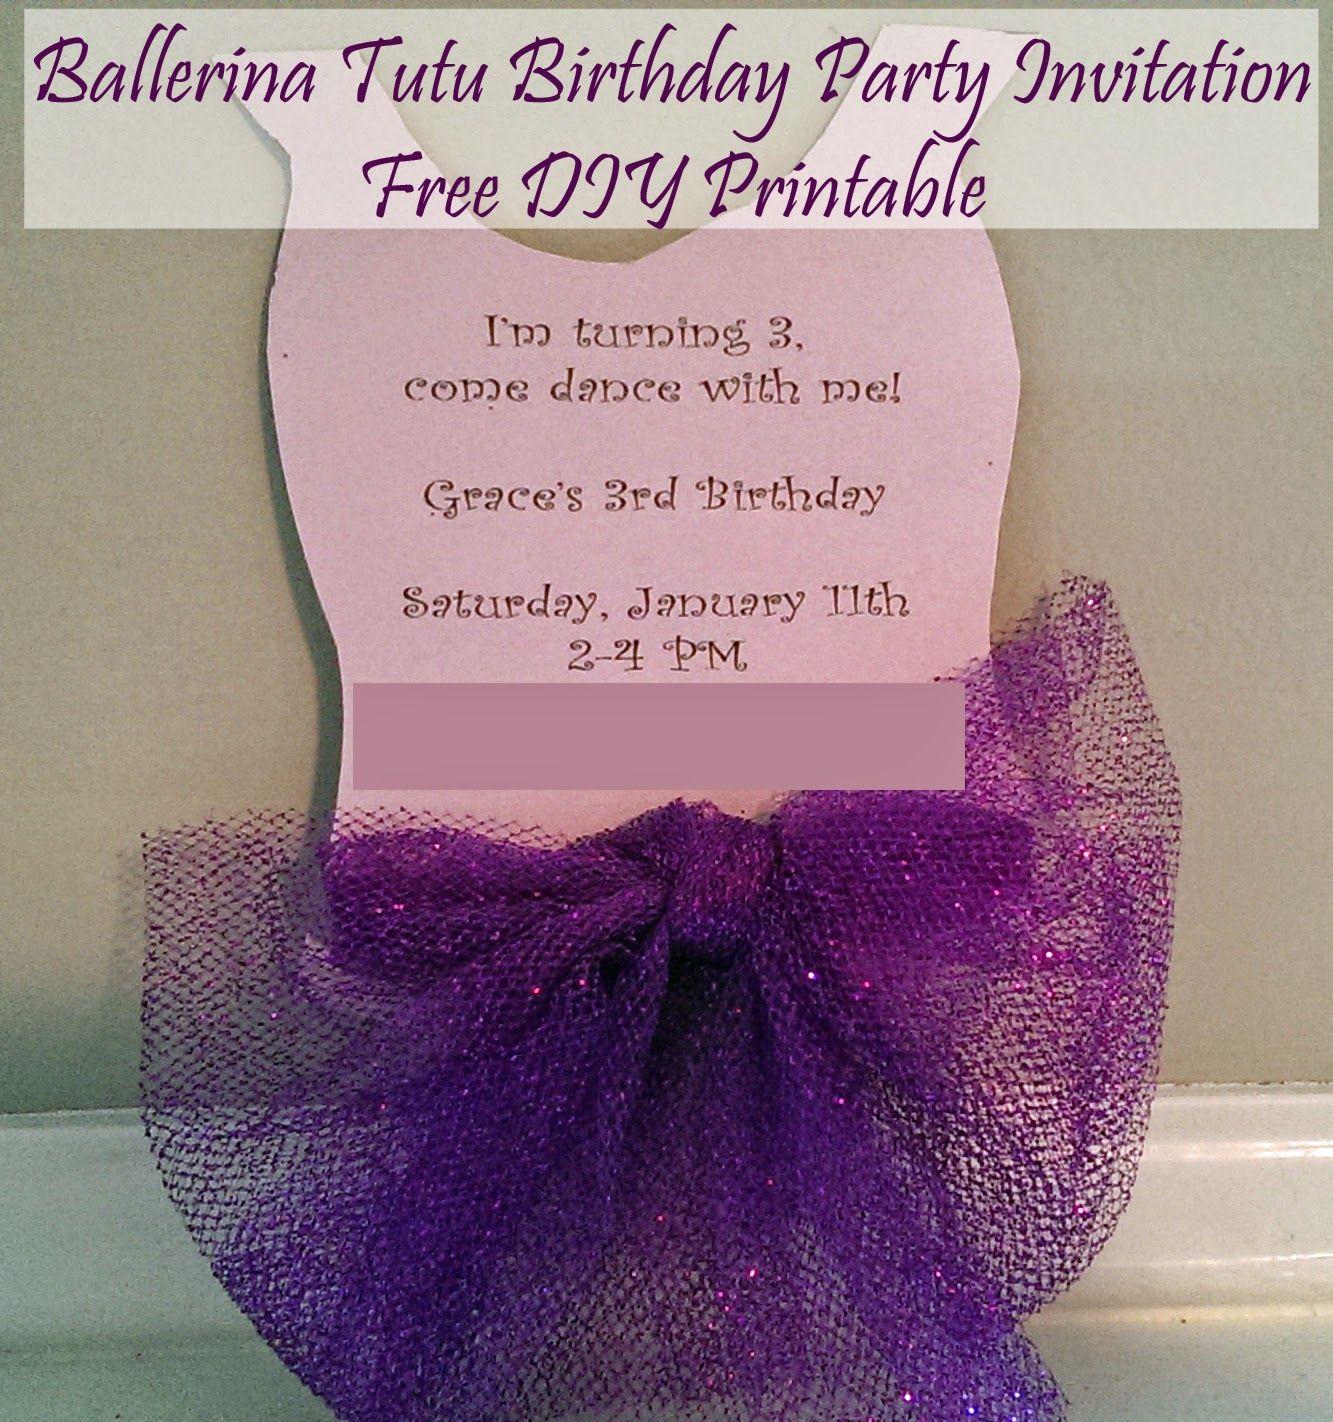 Ballerina Tutu DIY Party Invitation Free Printable | Ballet Party ...